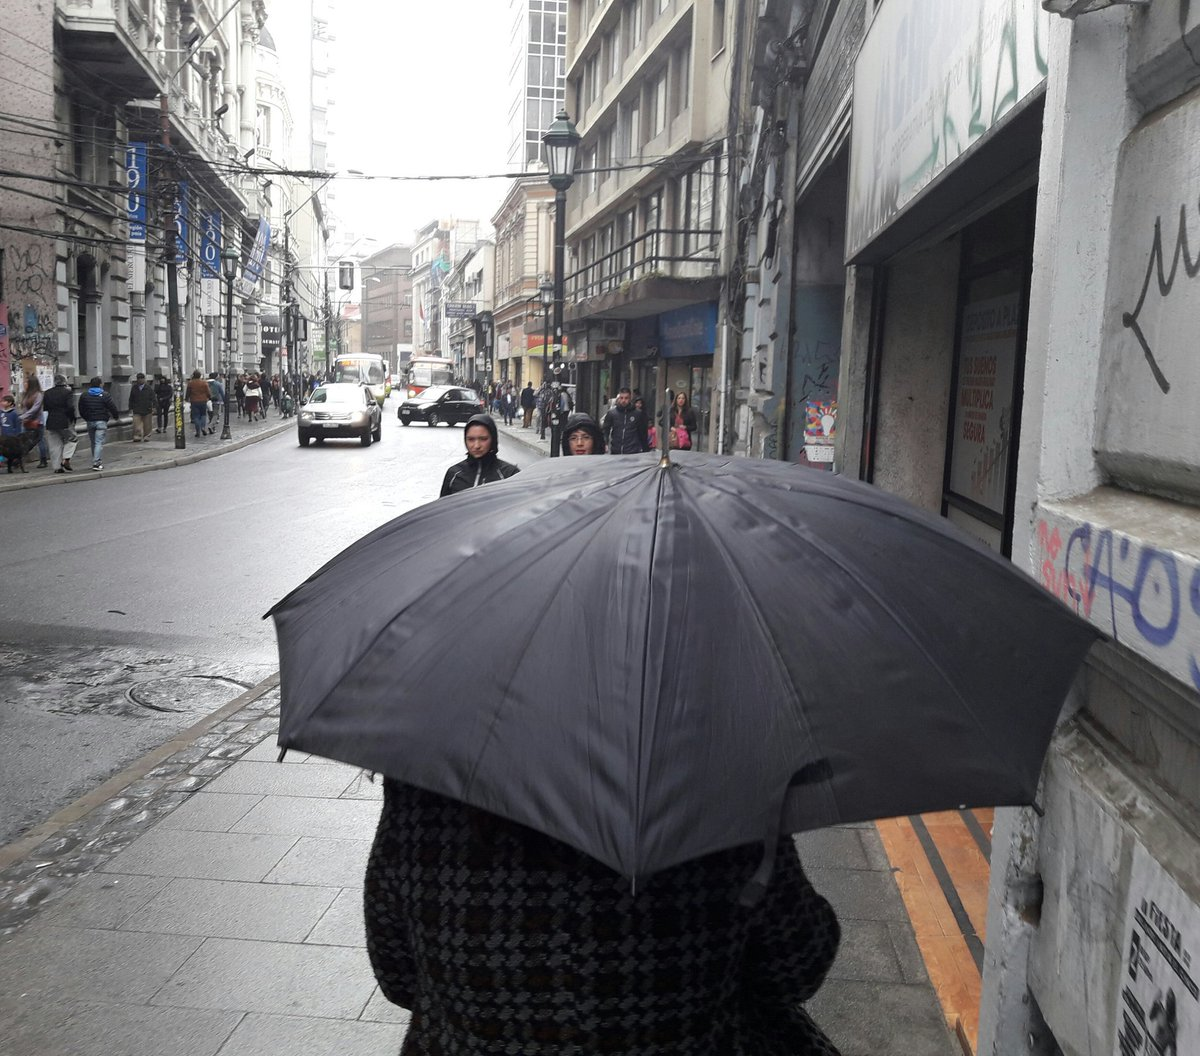 #FelizLunes con paraguas desde #Valparaí...